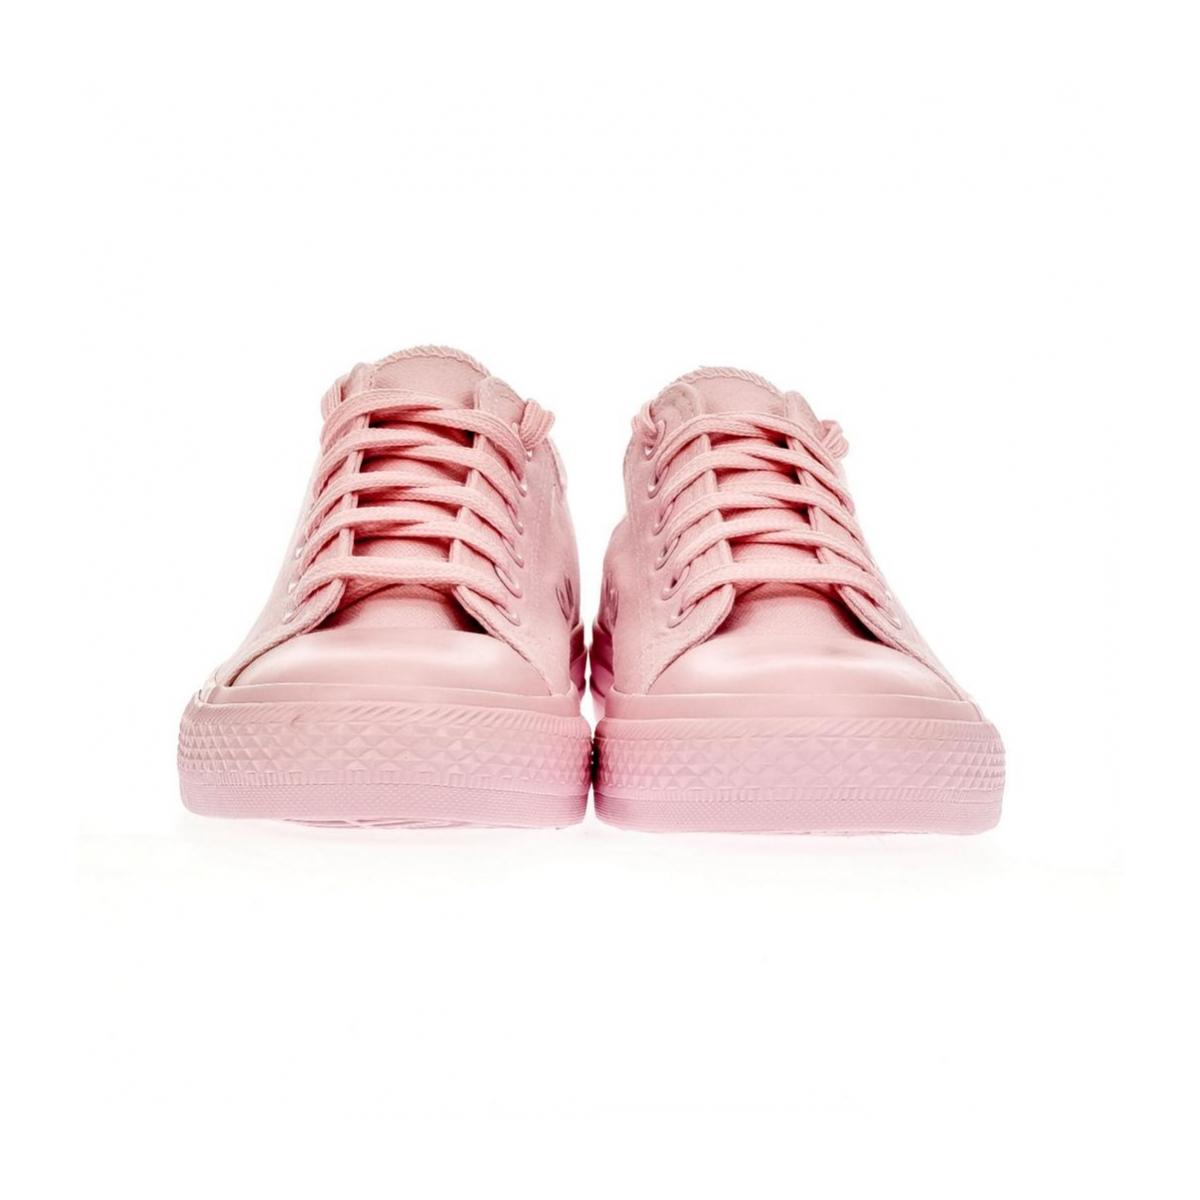 b6fae890afab Dámska svetlo-ružové tenisky REINA - 3